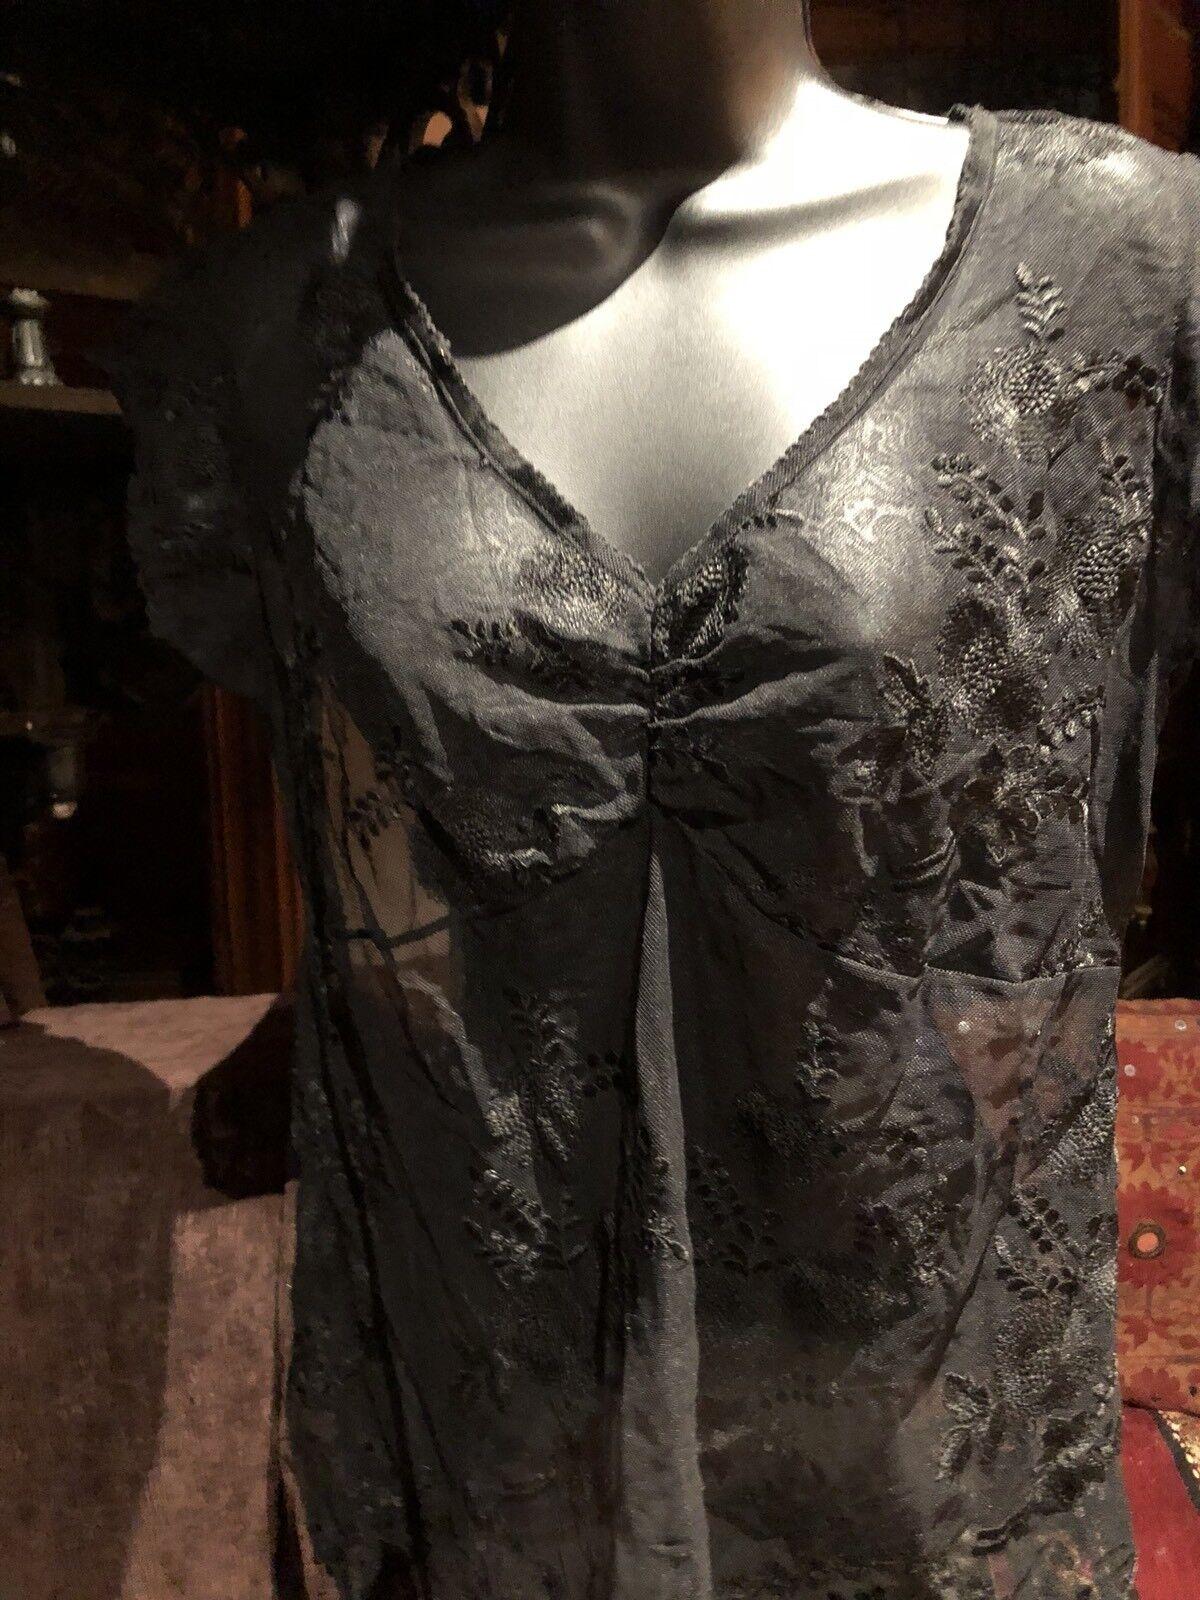 Vintage Sheer Black Lace Gothic Corset Bustier Top - image 1